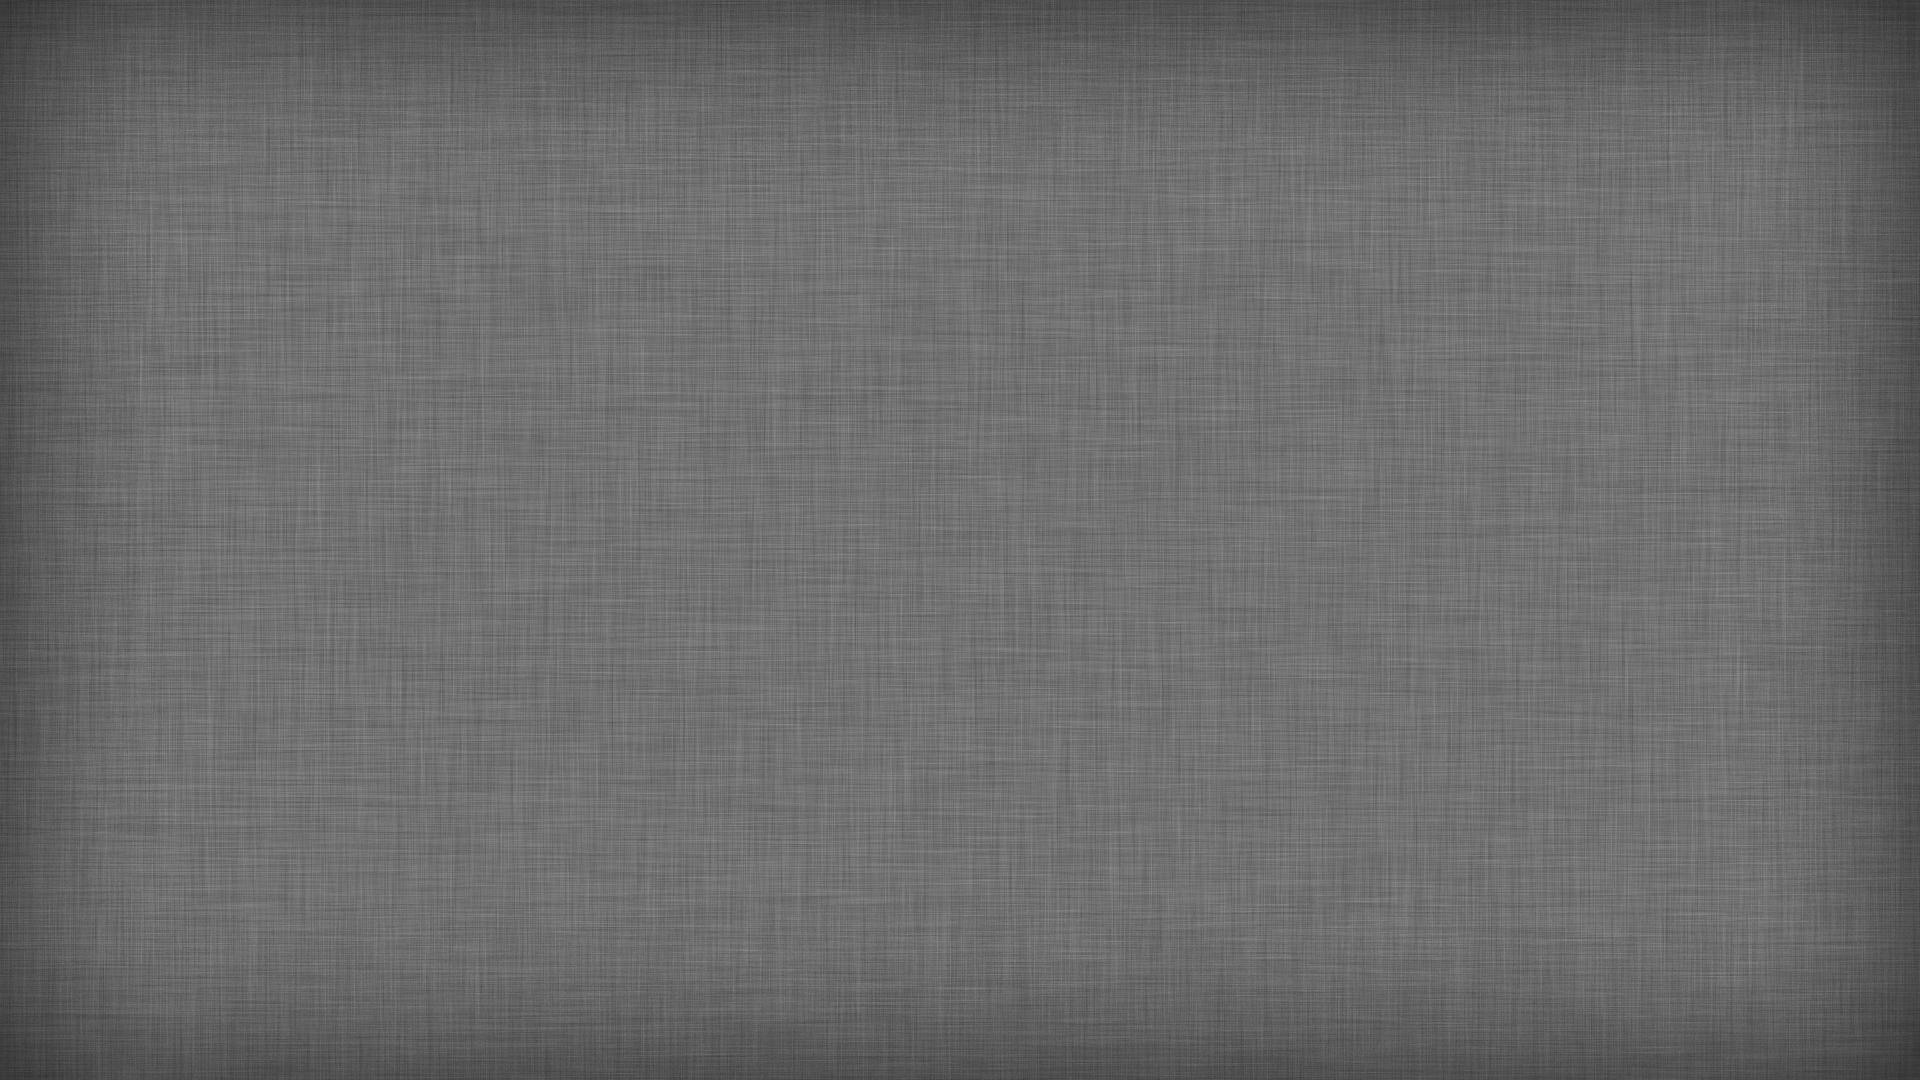 Grill Texture Free Texrura Metal Ios Linen Grey By HD Wallpaper